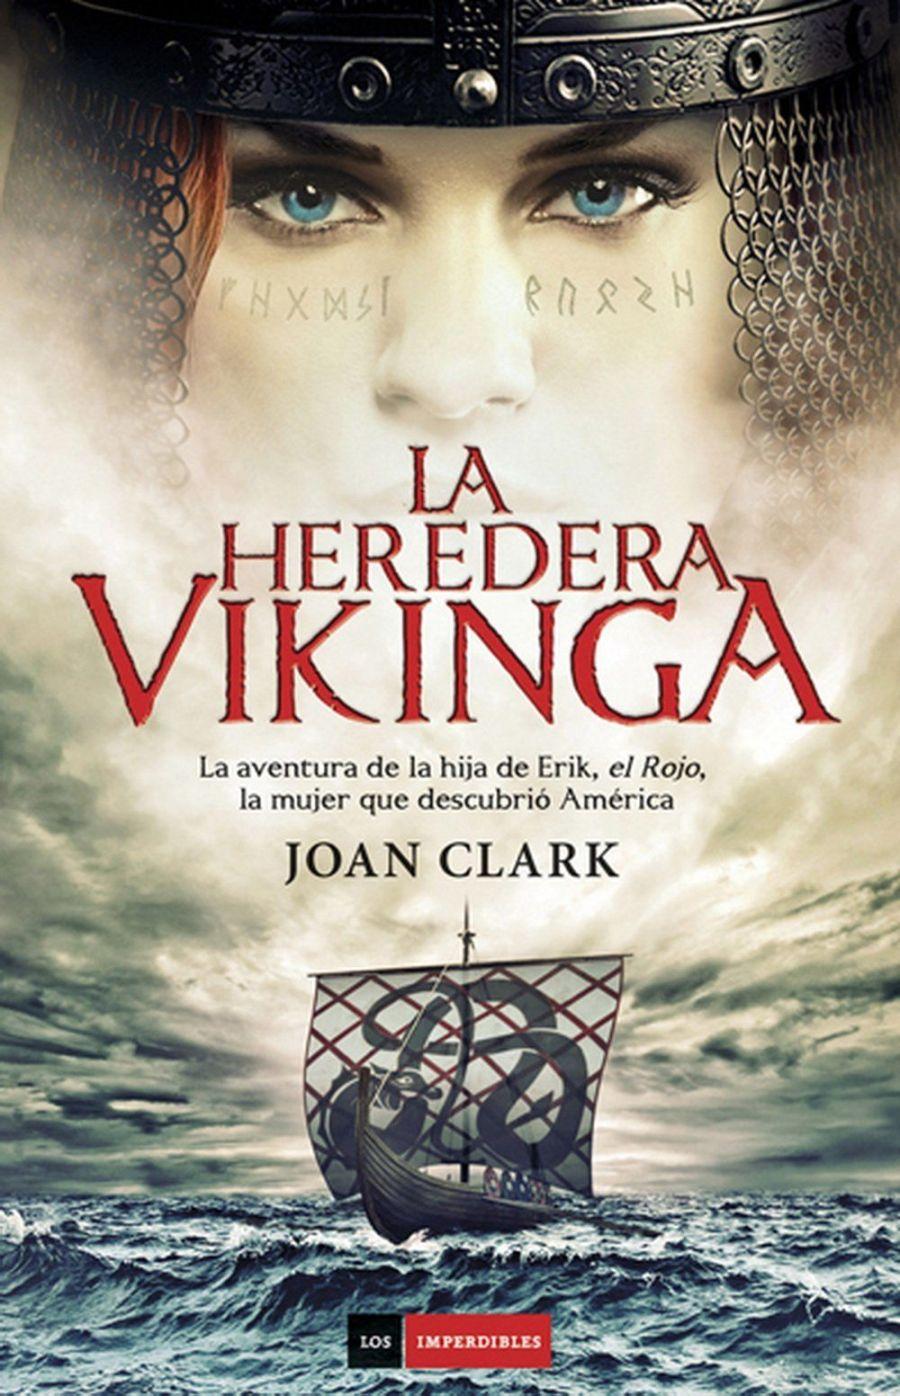 La heredera vikinga Book Cover